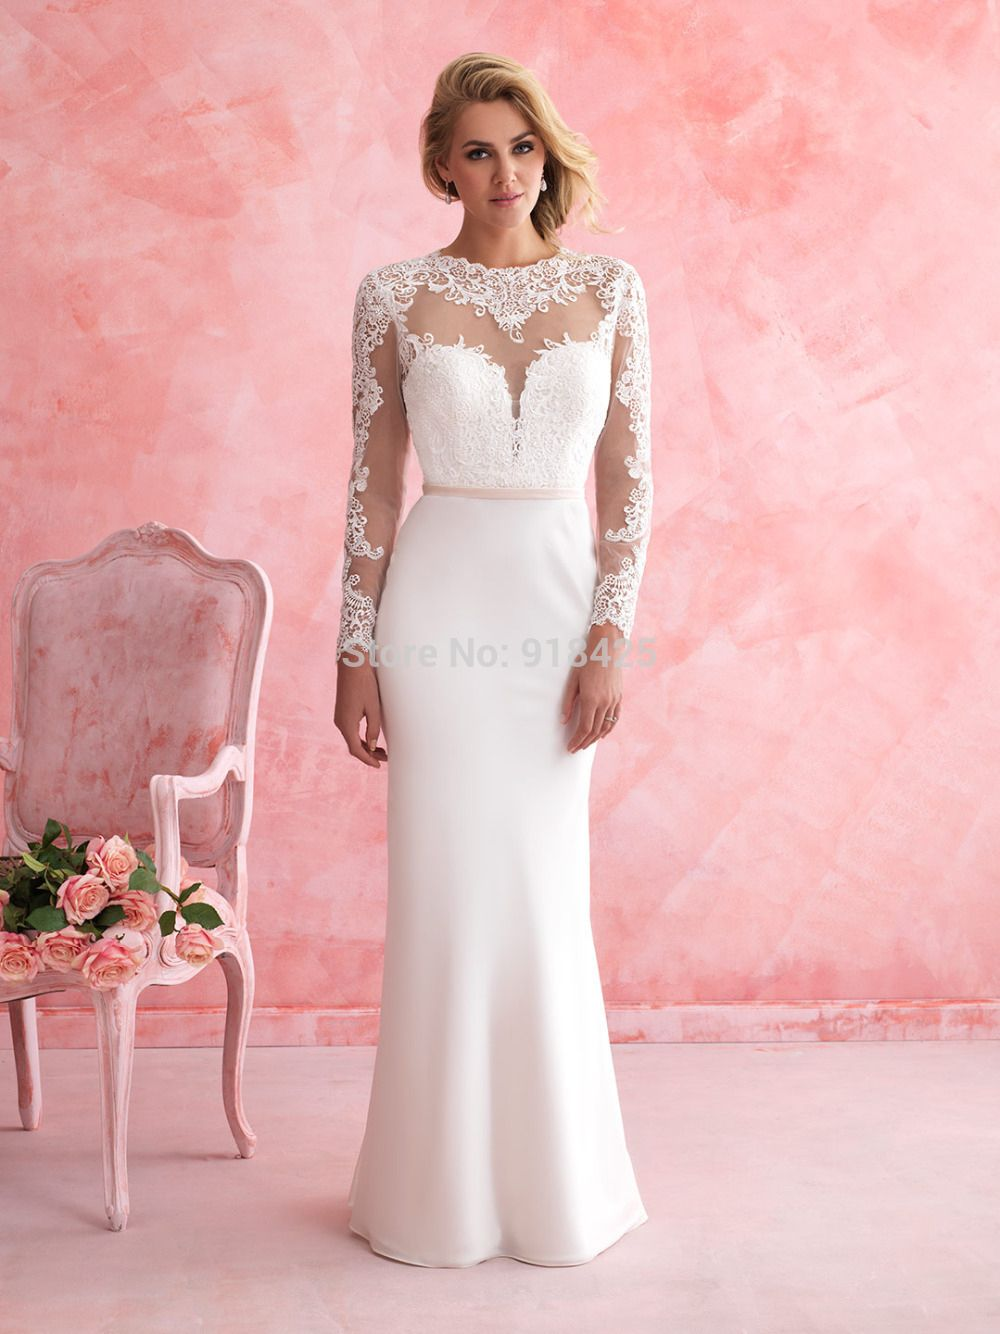 long dresses for wedding reception cute dresses for a wedding